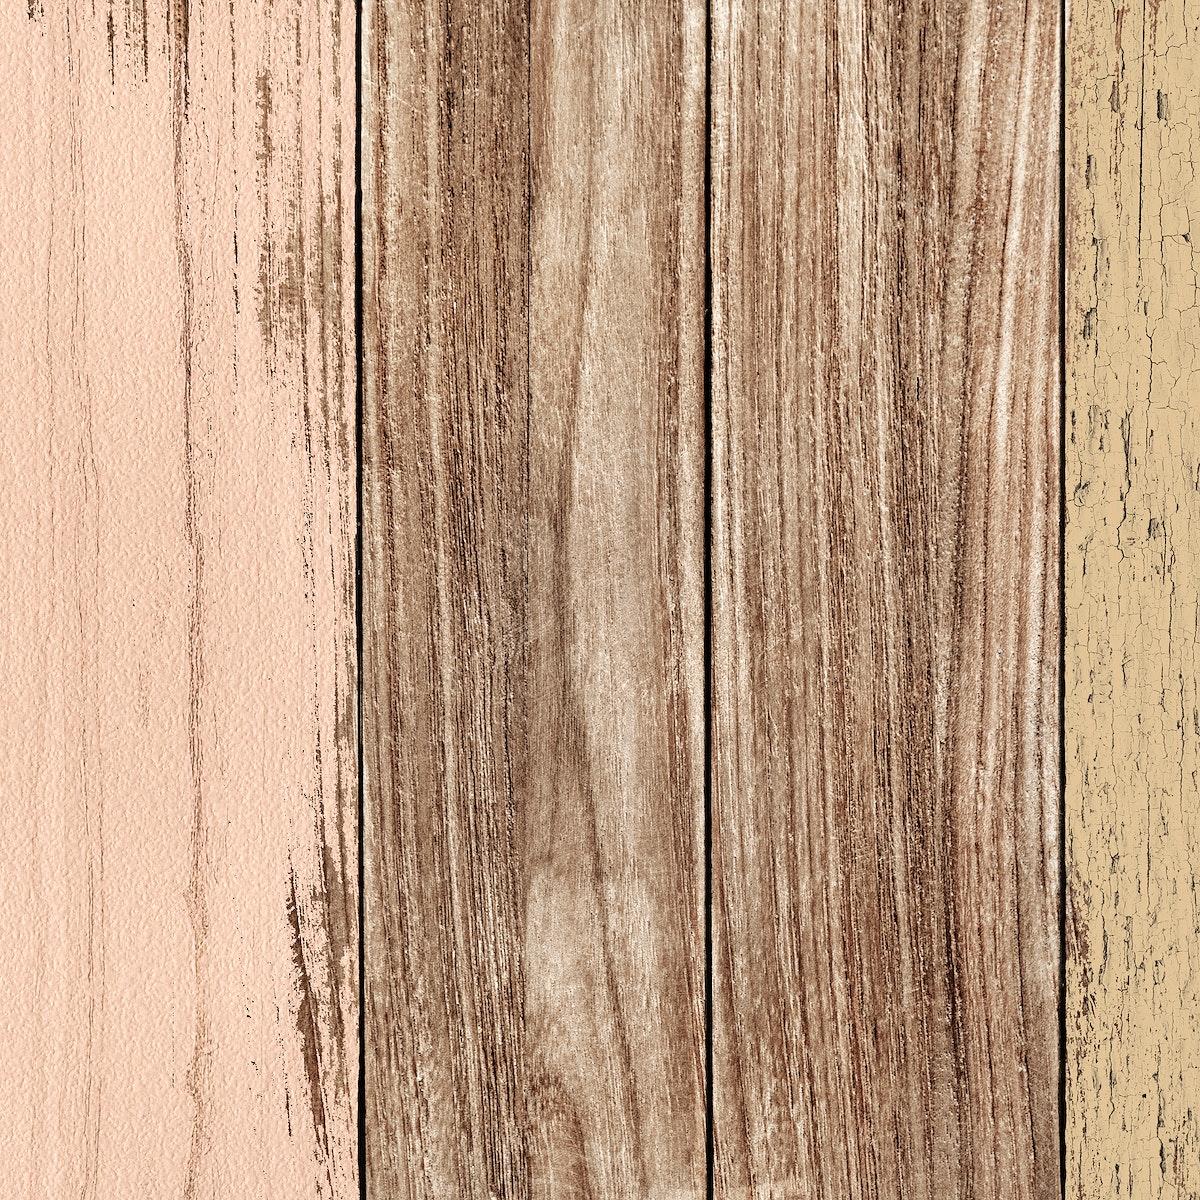 Scratched beige wood textured background